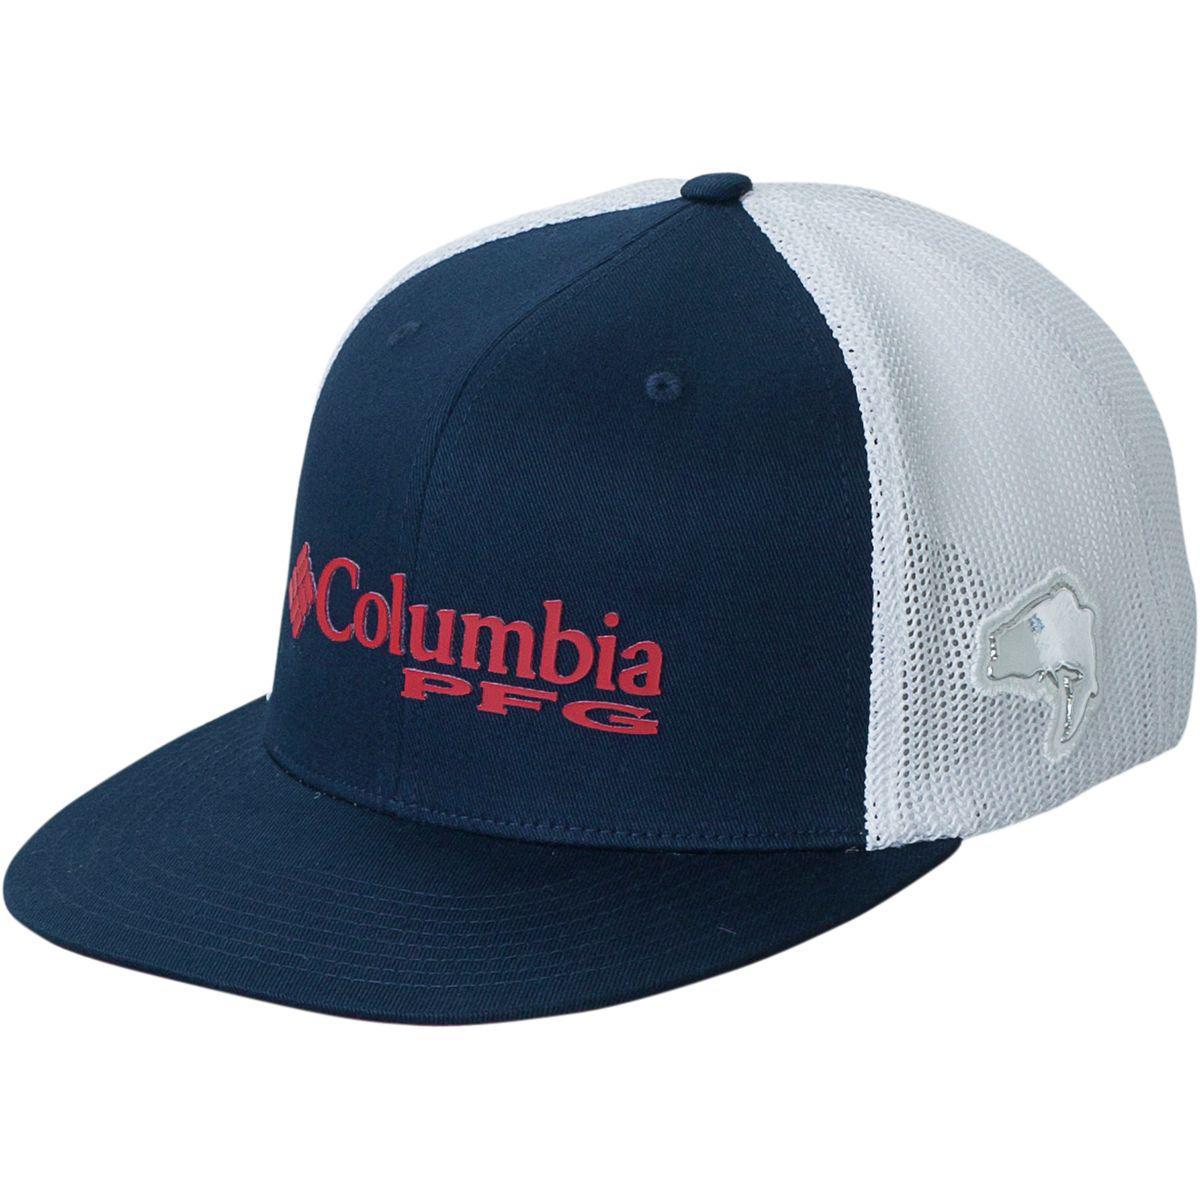 7338c34848c Columbia - Blue Pfg Mesh Flat Brim Hat for Men - Lyst. View fullscreen